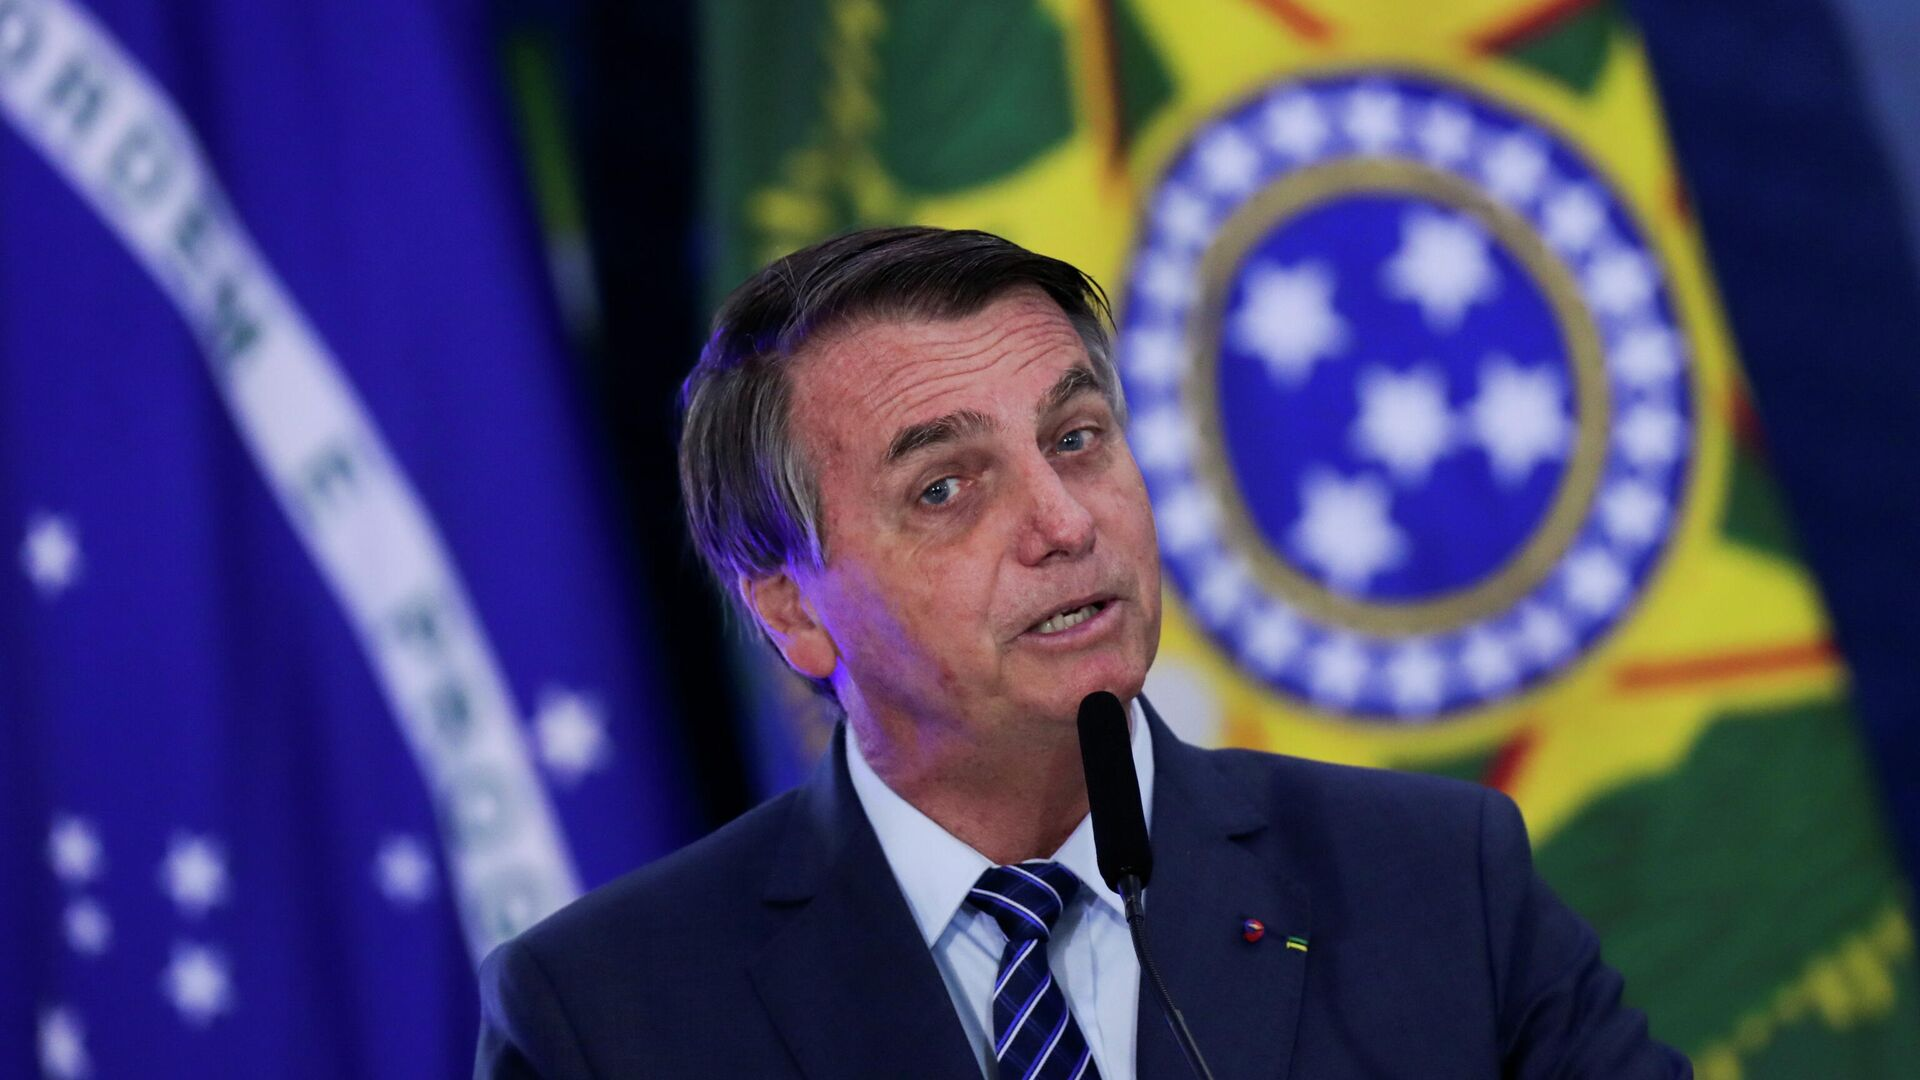 Jair Bolsonaro, presidente de Brasil - Sputnik Mundo, 1920, 07.05.2021